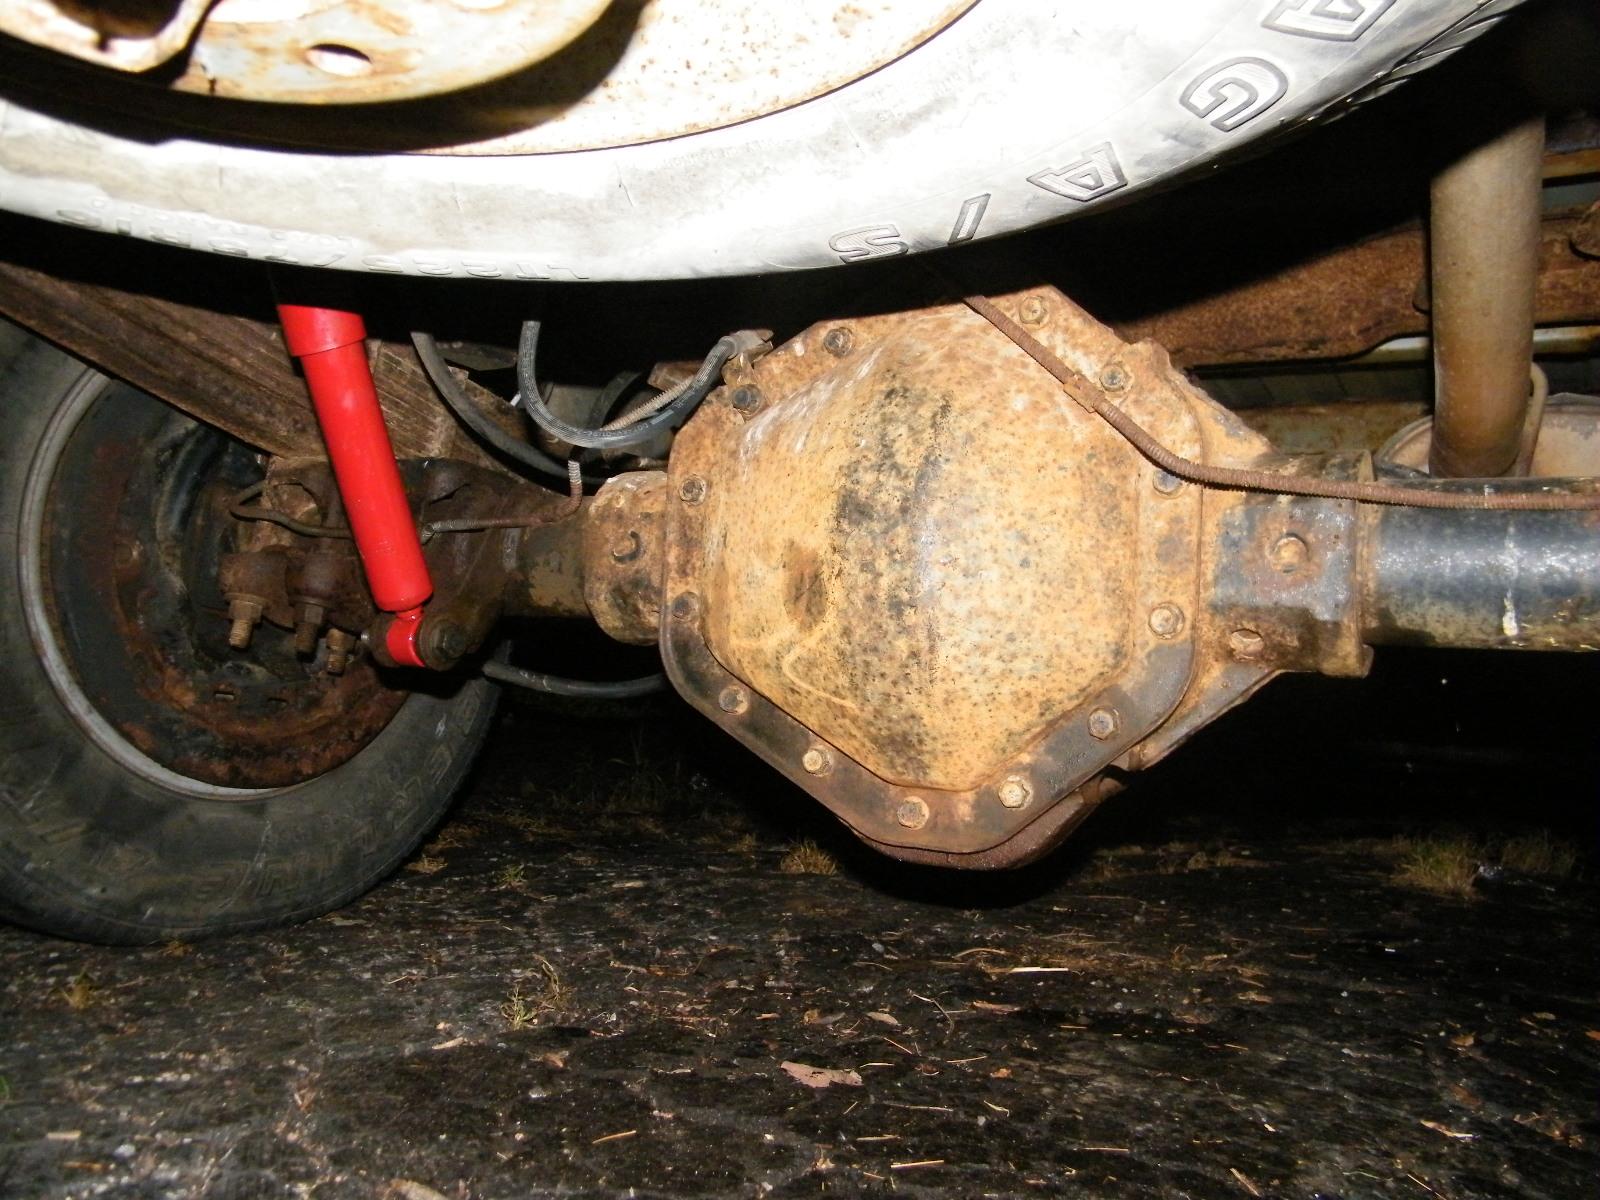 Gmc Sierra Rear End Noise Html Autos Post